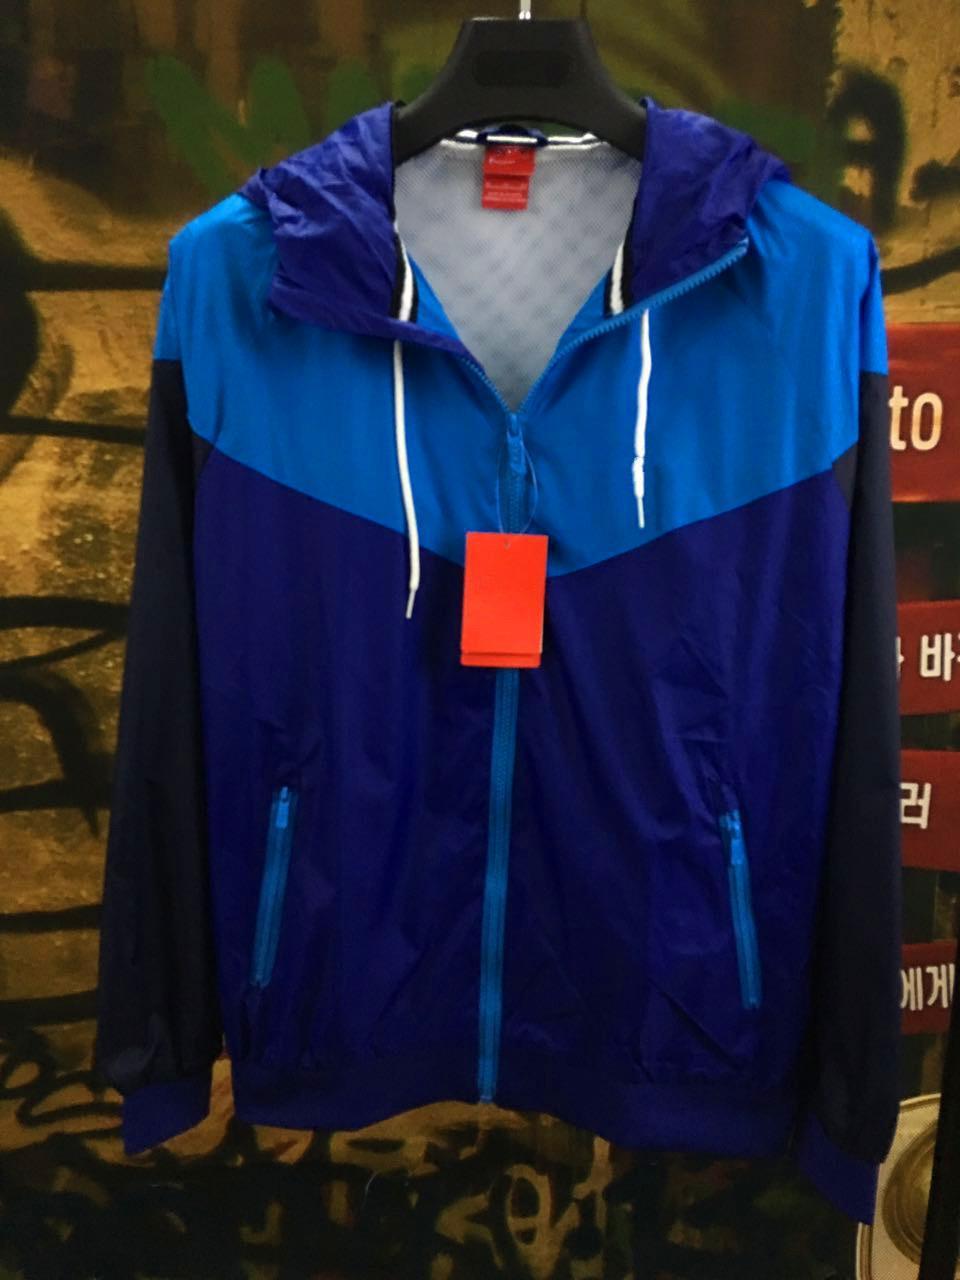 Moda-Hombres Primavera Otoño Windrunner Jacket Thin Jacket Coat Hombres Sports Windbreaker Casual Paneled Coats Hombre Chándal Envío gratis